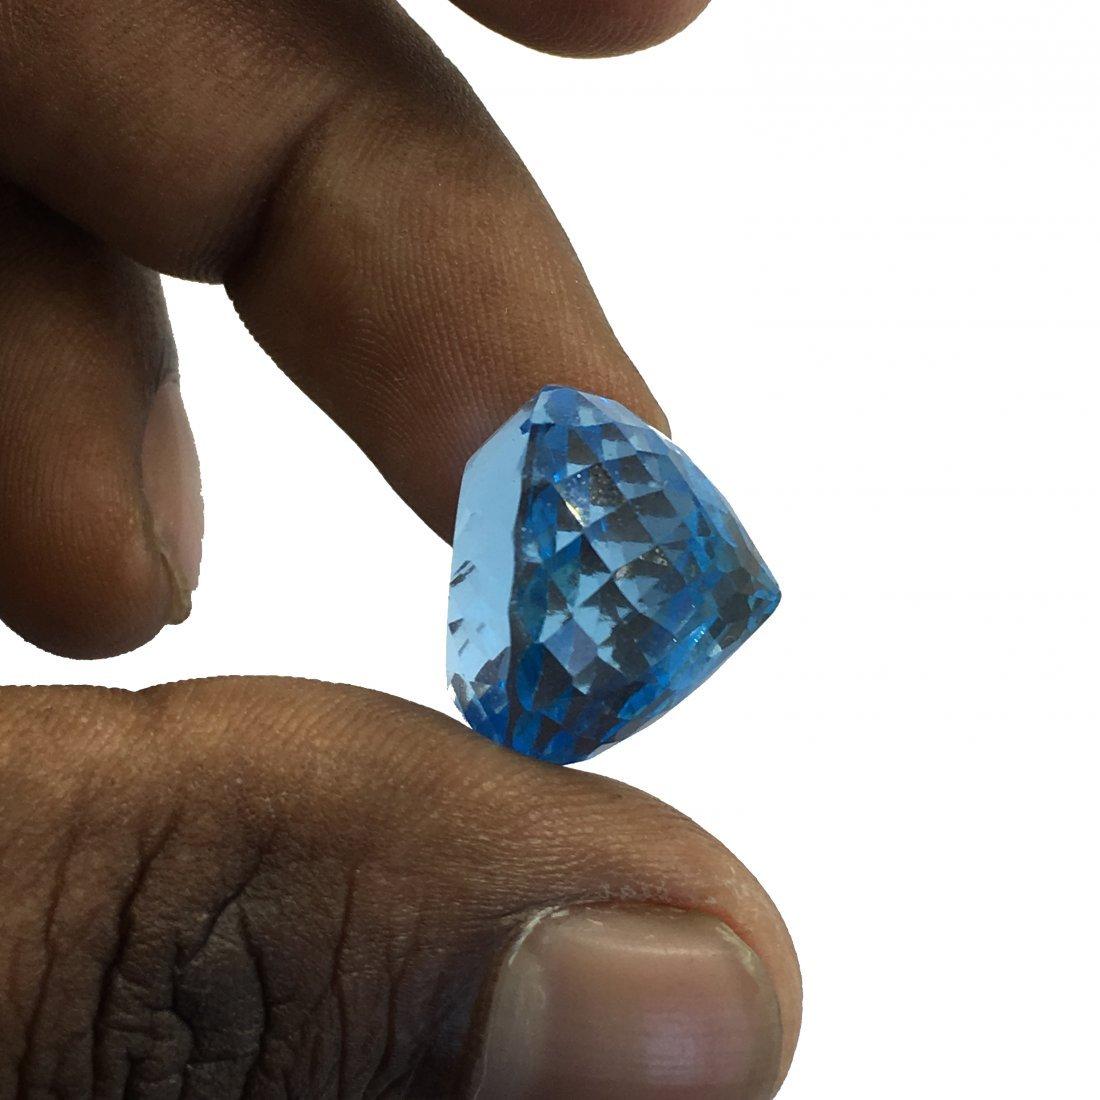 42.51 Carats  Natural Unheated Blue Topaz - 2